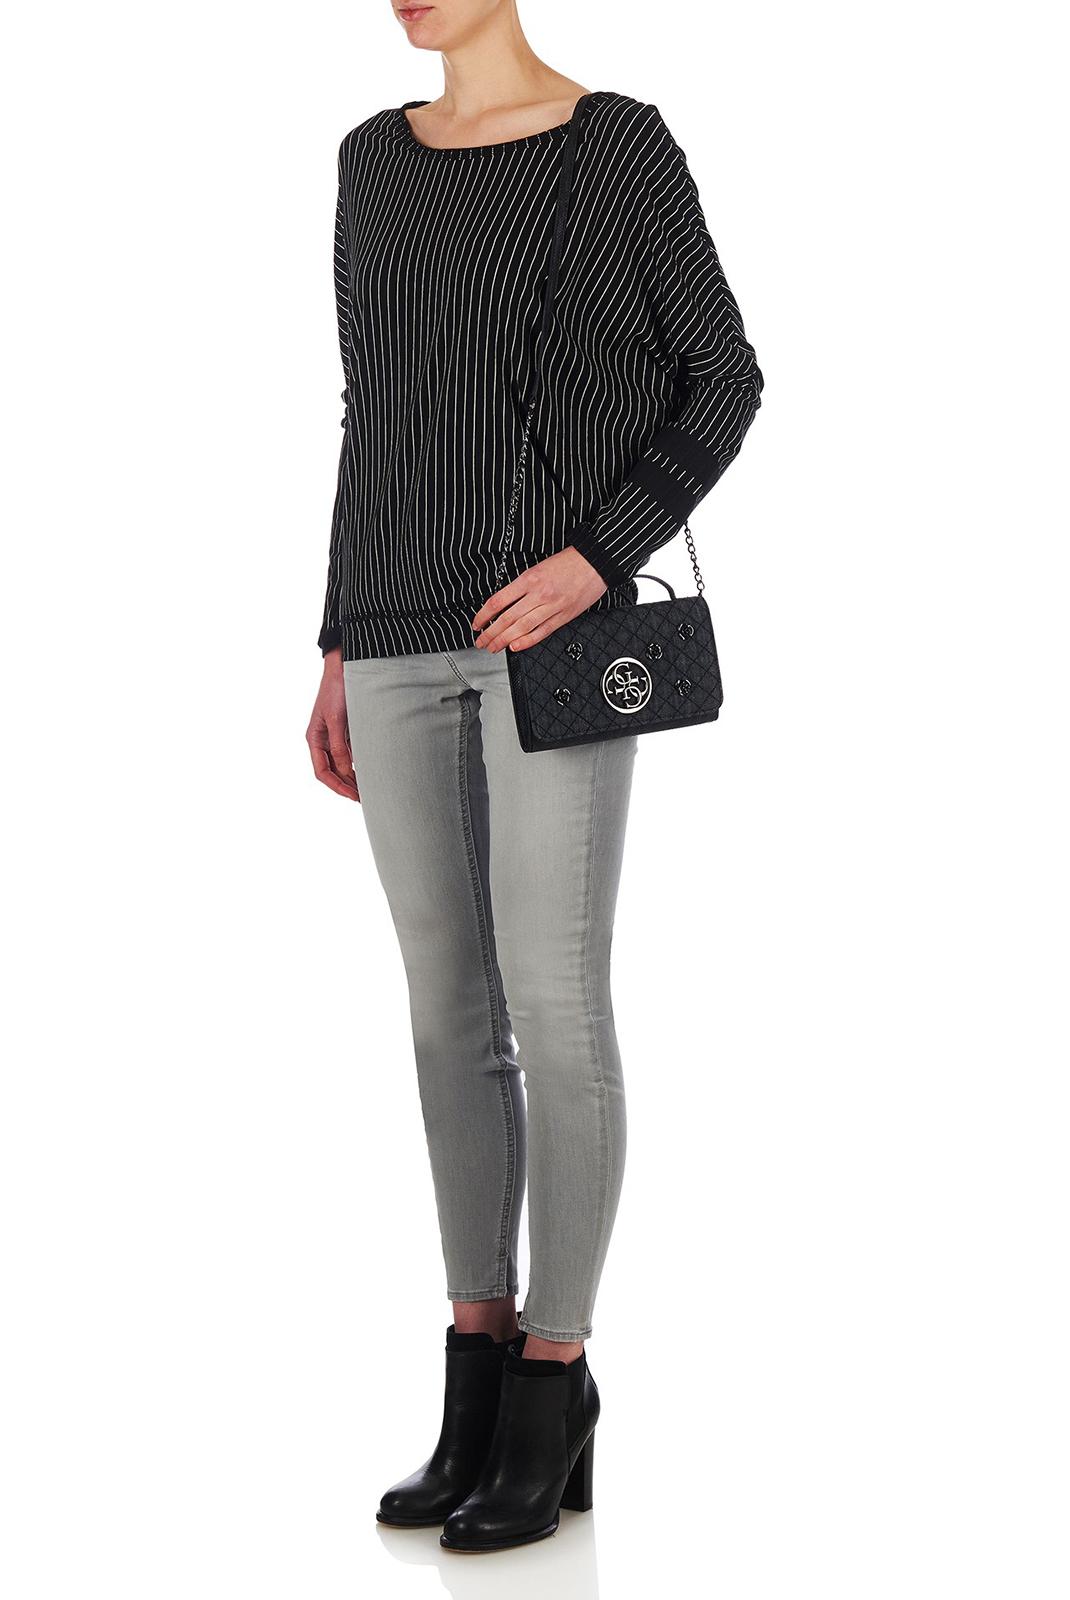 Pochettes  Guess jeans HWDB66 23790 BLACK